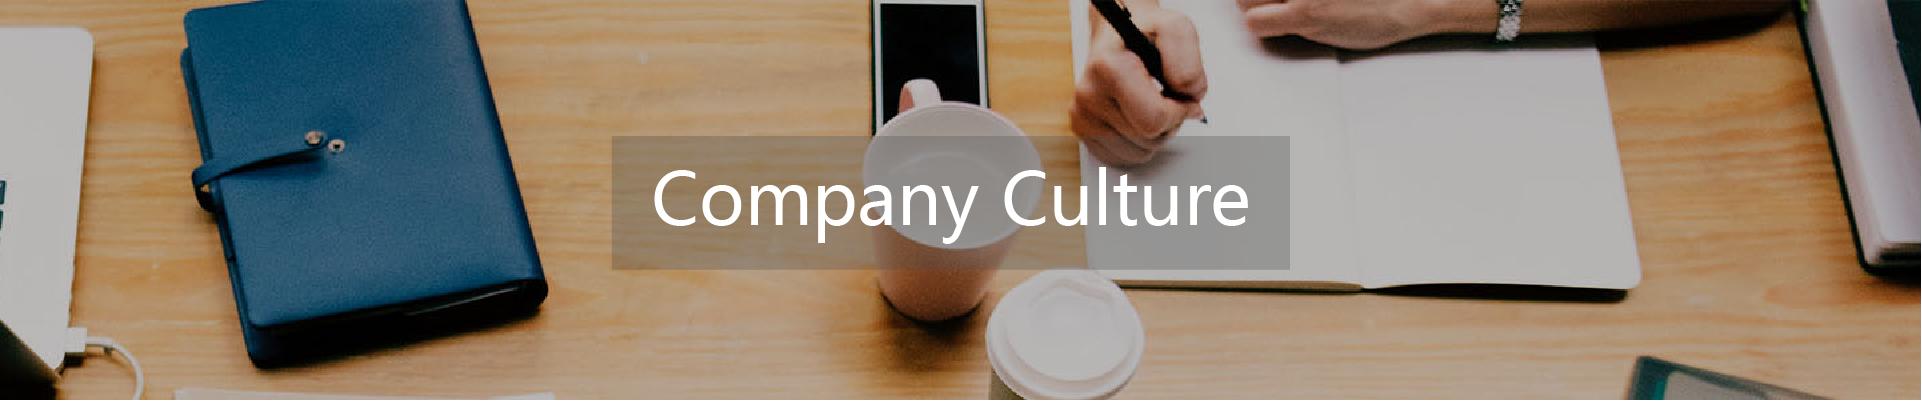 企业文化-Banner